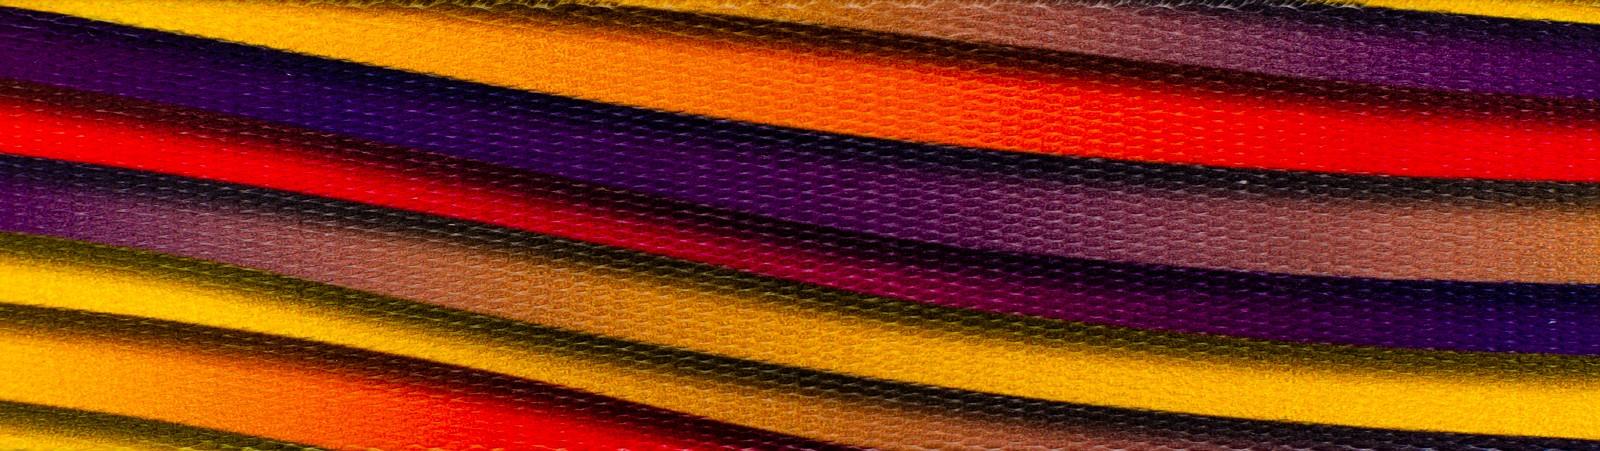 5 Yards Country Brook Design® 1 Inch Margarita Argyle Polyester Webbing